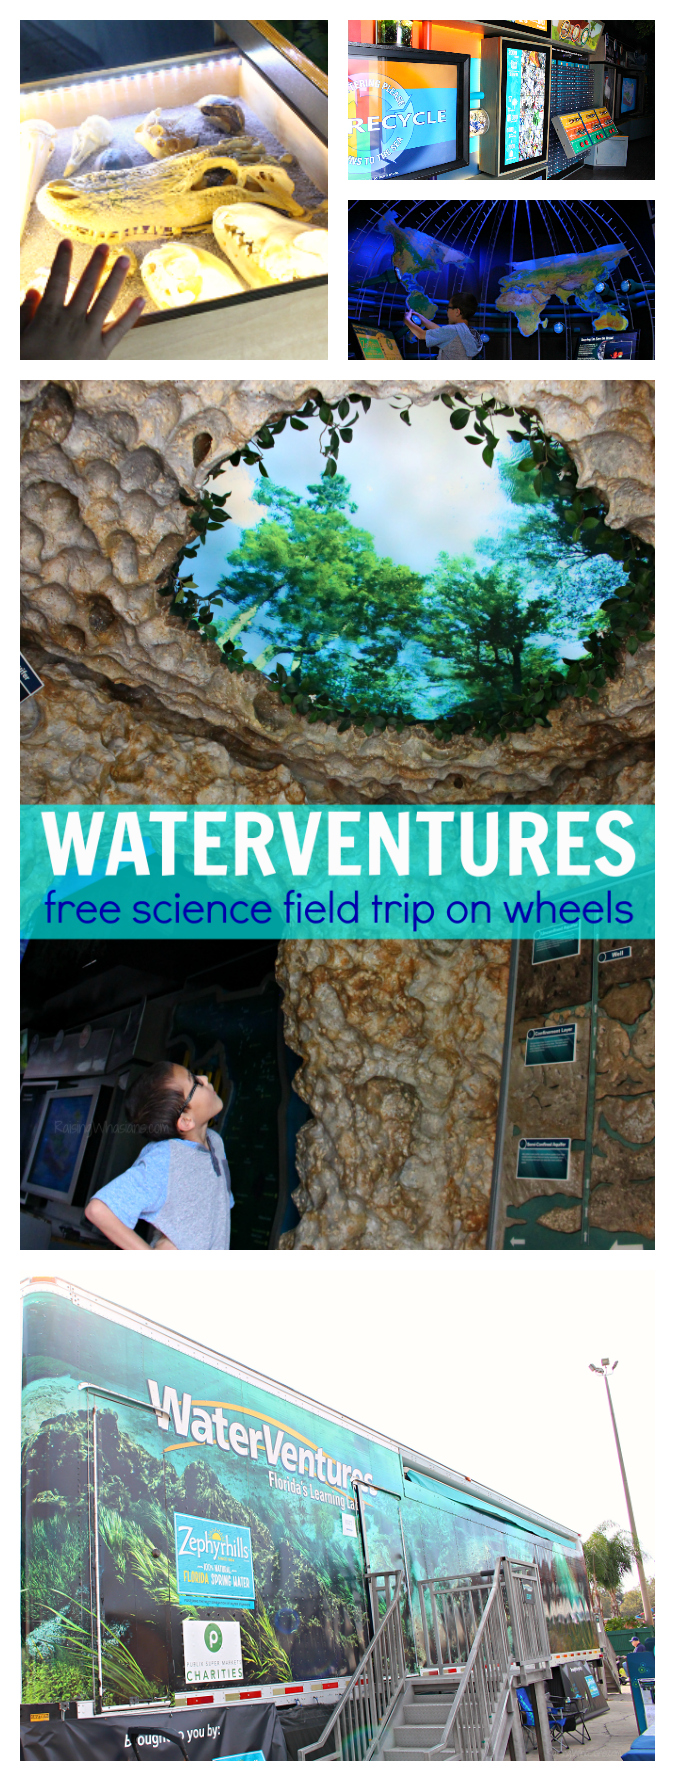 WaterVentures lab